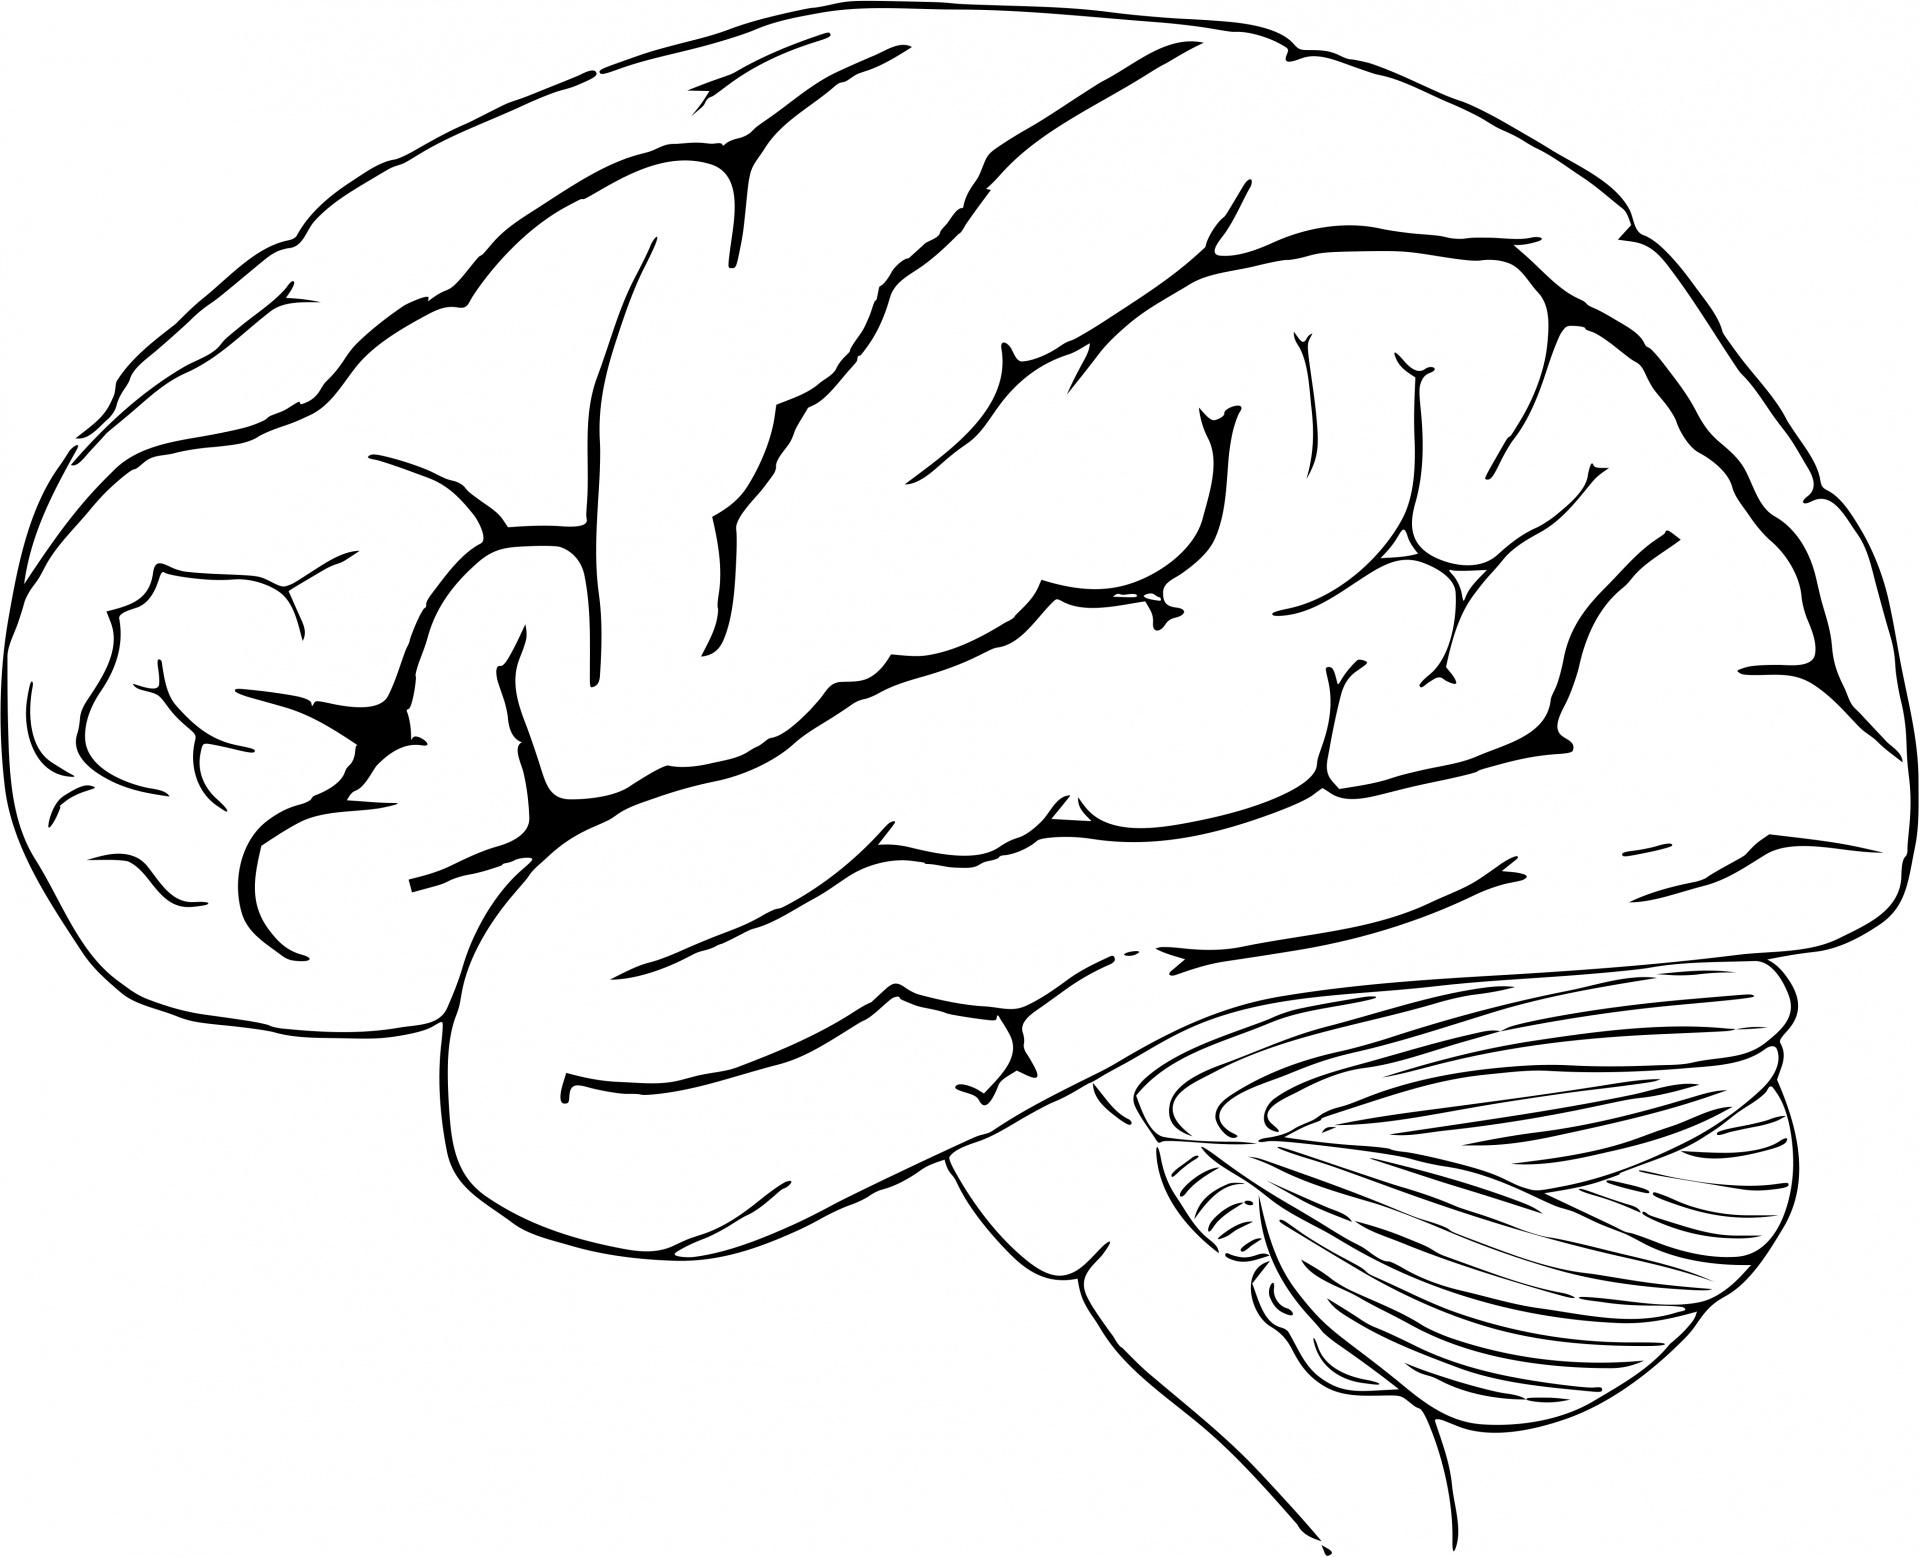 Human Brain Free Stock Photo